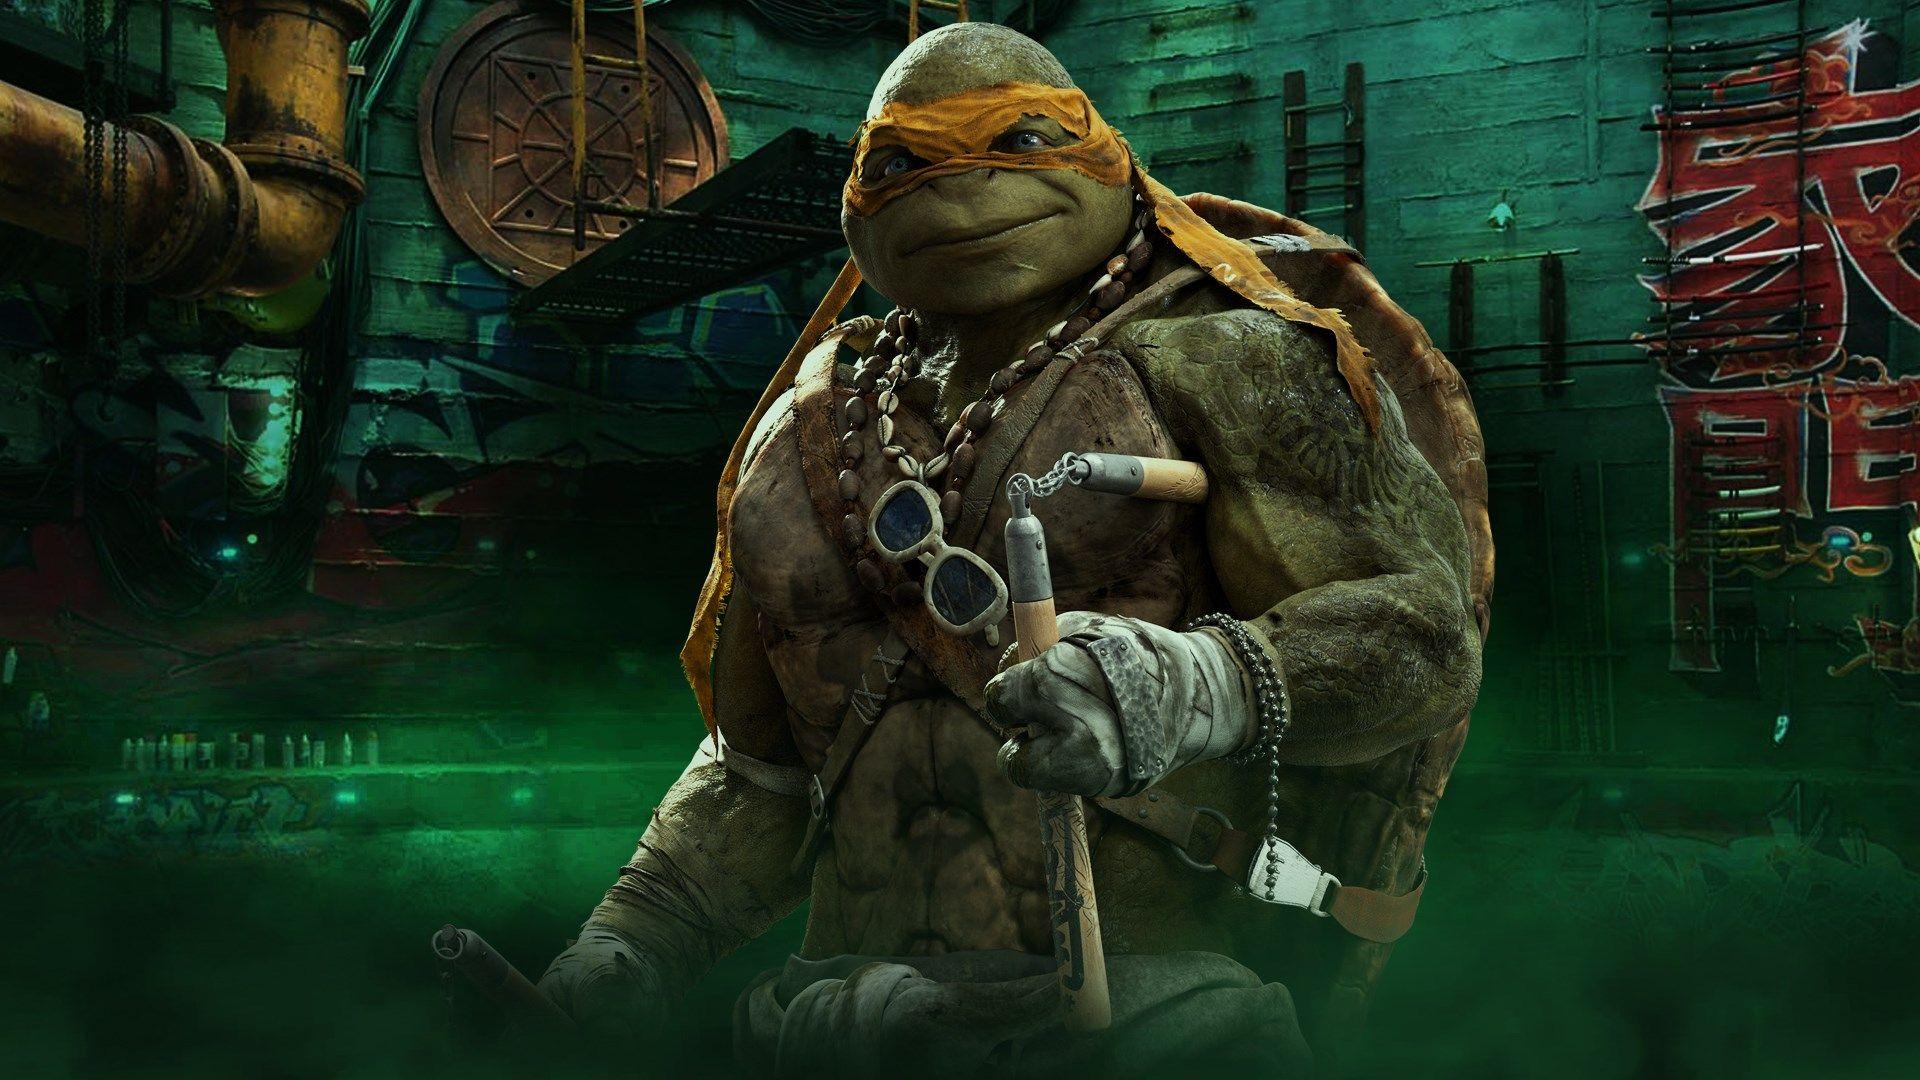 Desktop Ninja Turtles Hd Wallpapers Free Download With Images